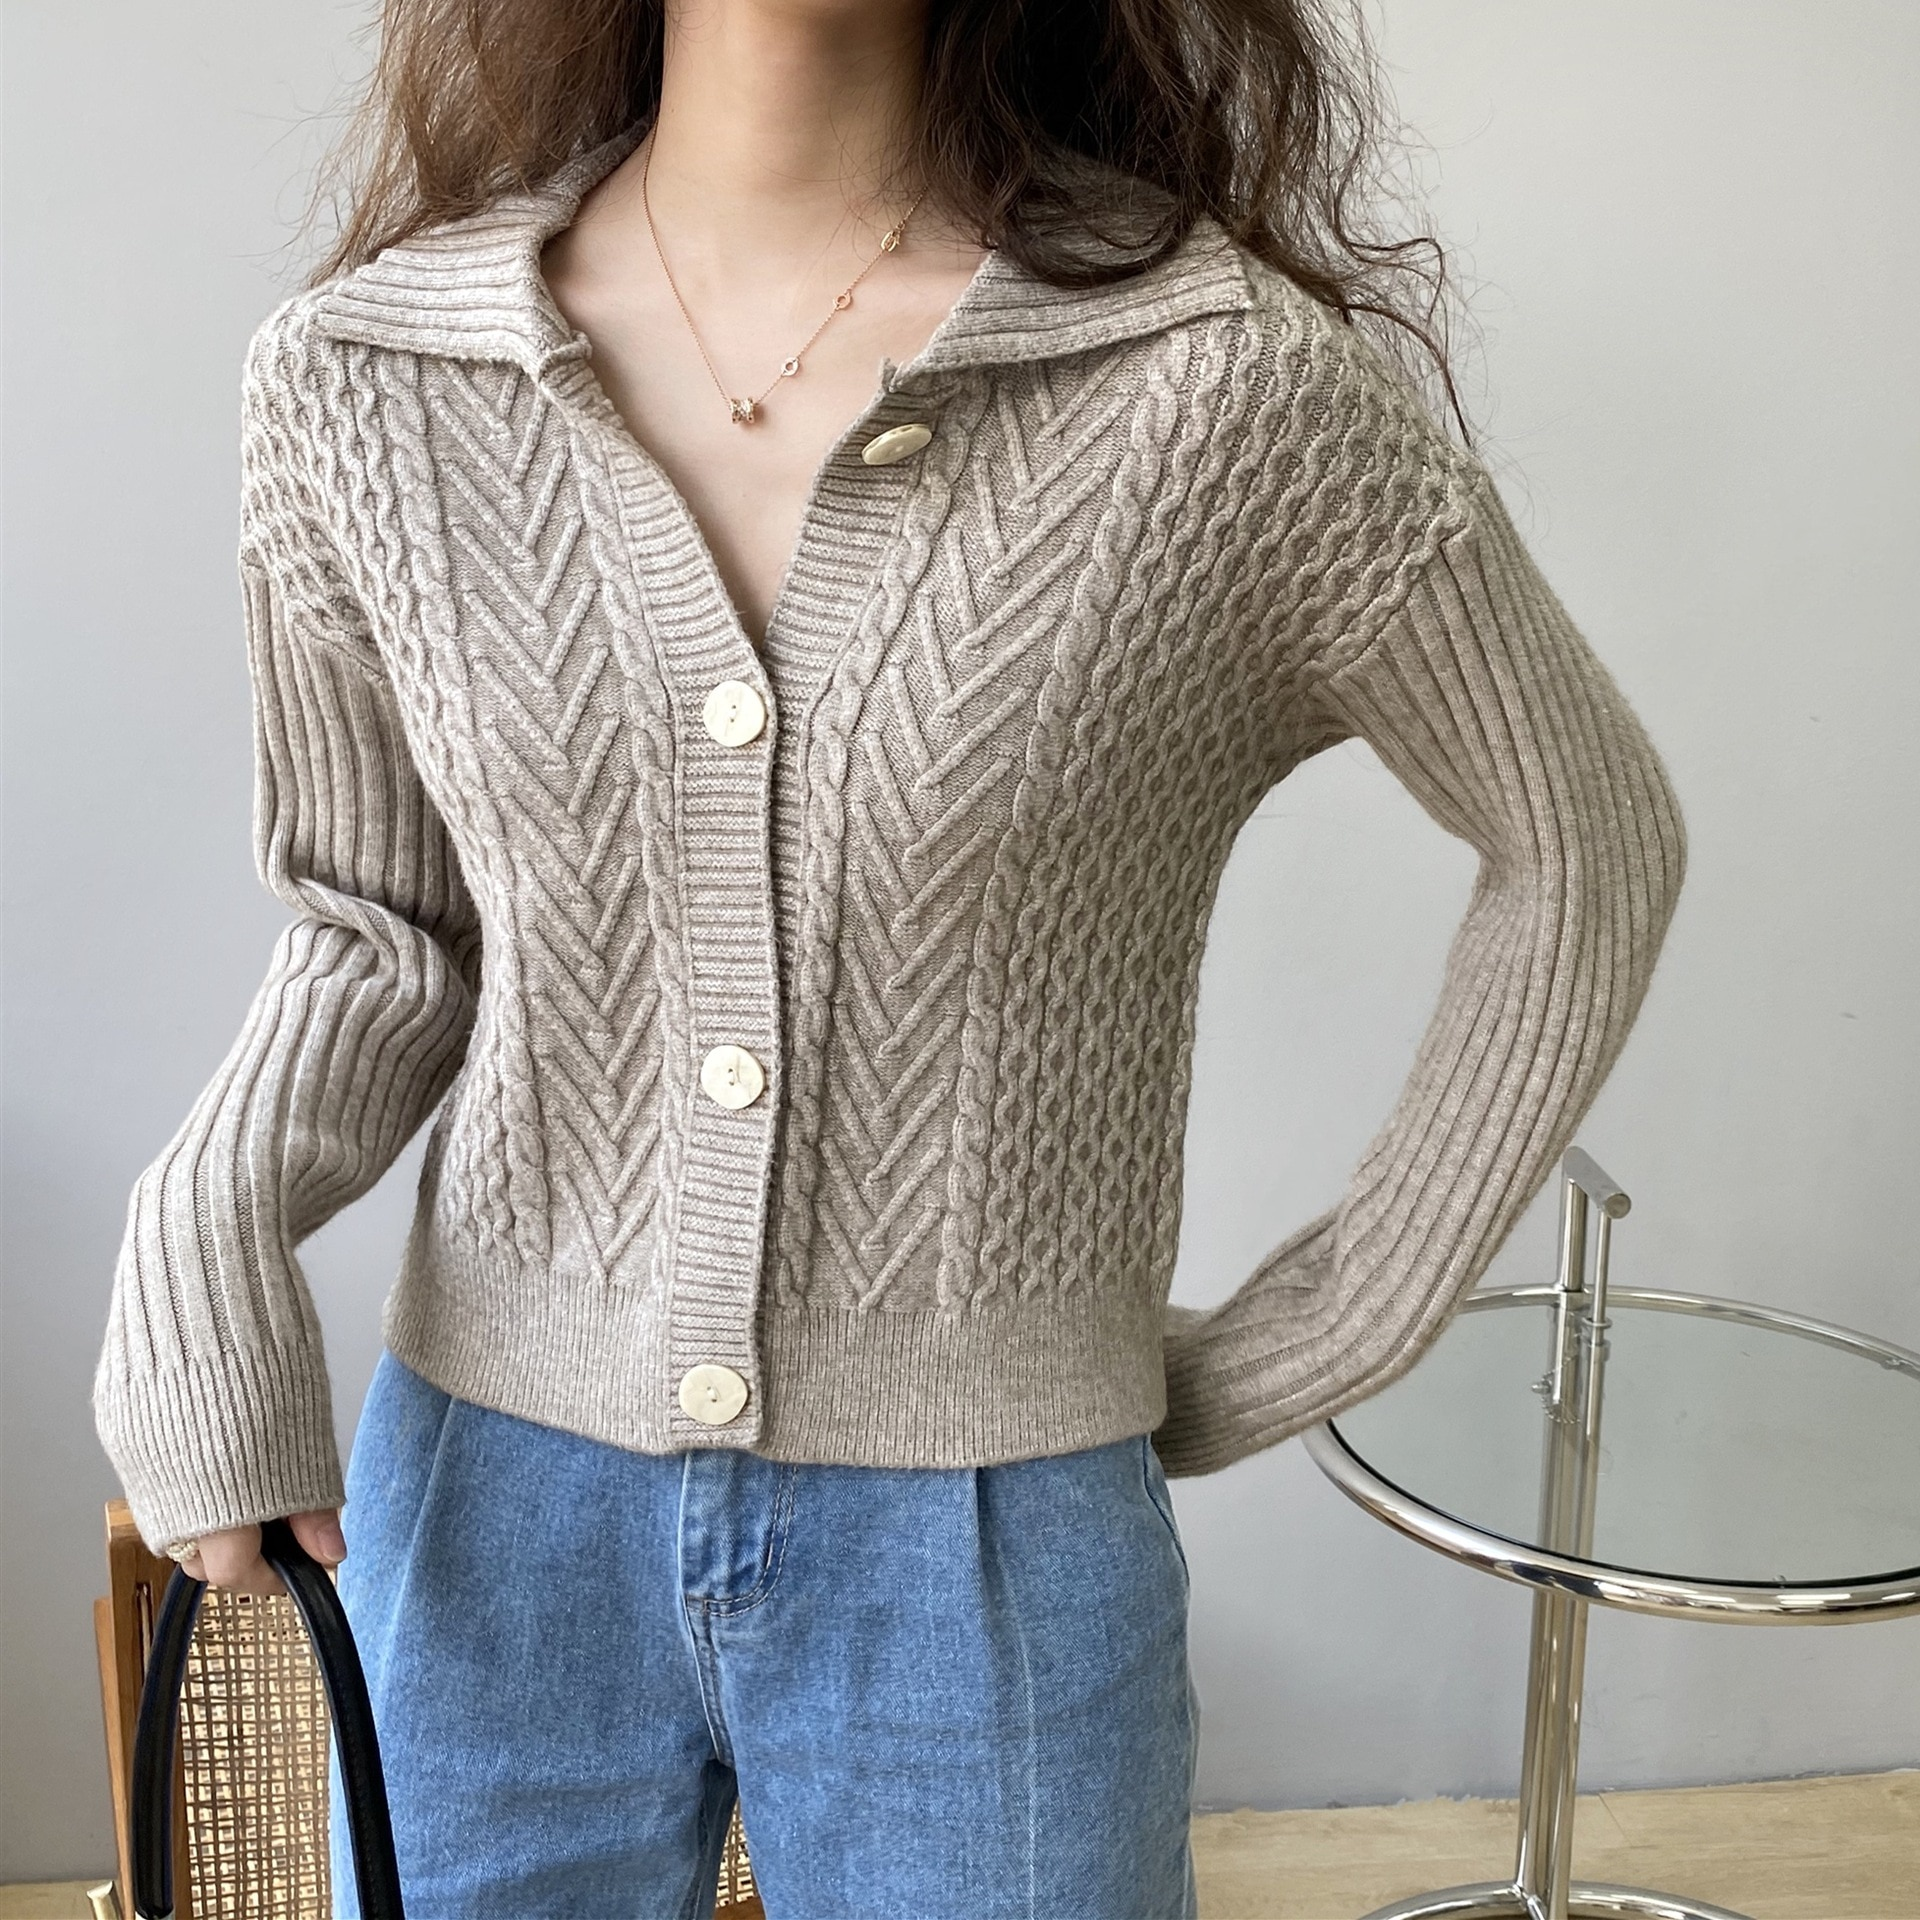 2021 Autumn Women Turn Down Collar Sweater Long Sleeve Design Slim Body Knitted Fashion Sweater Casual Women Cardigans Femme enlarge